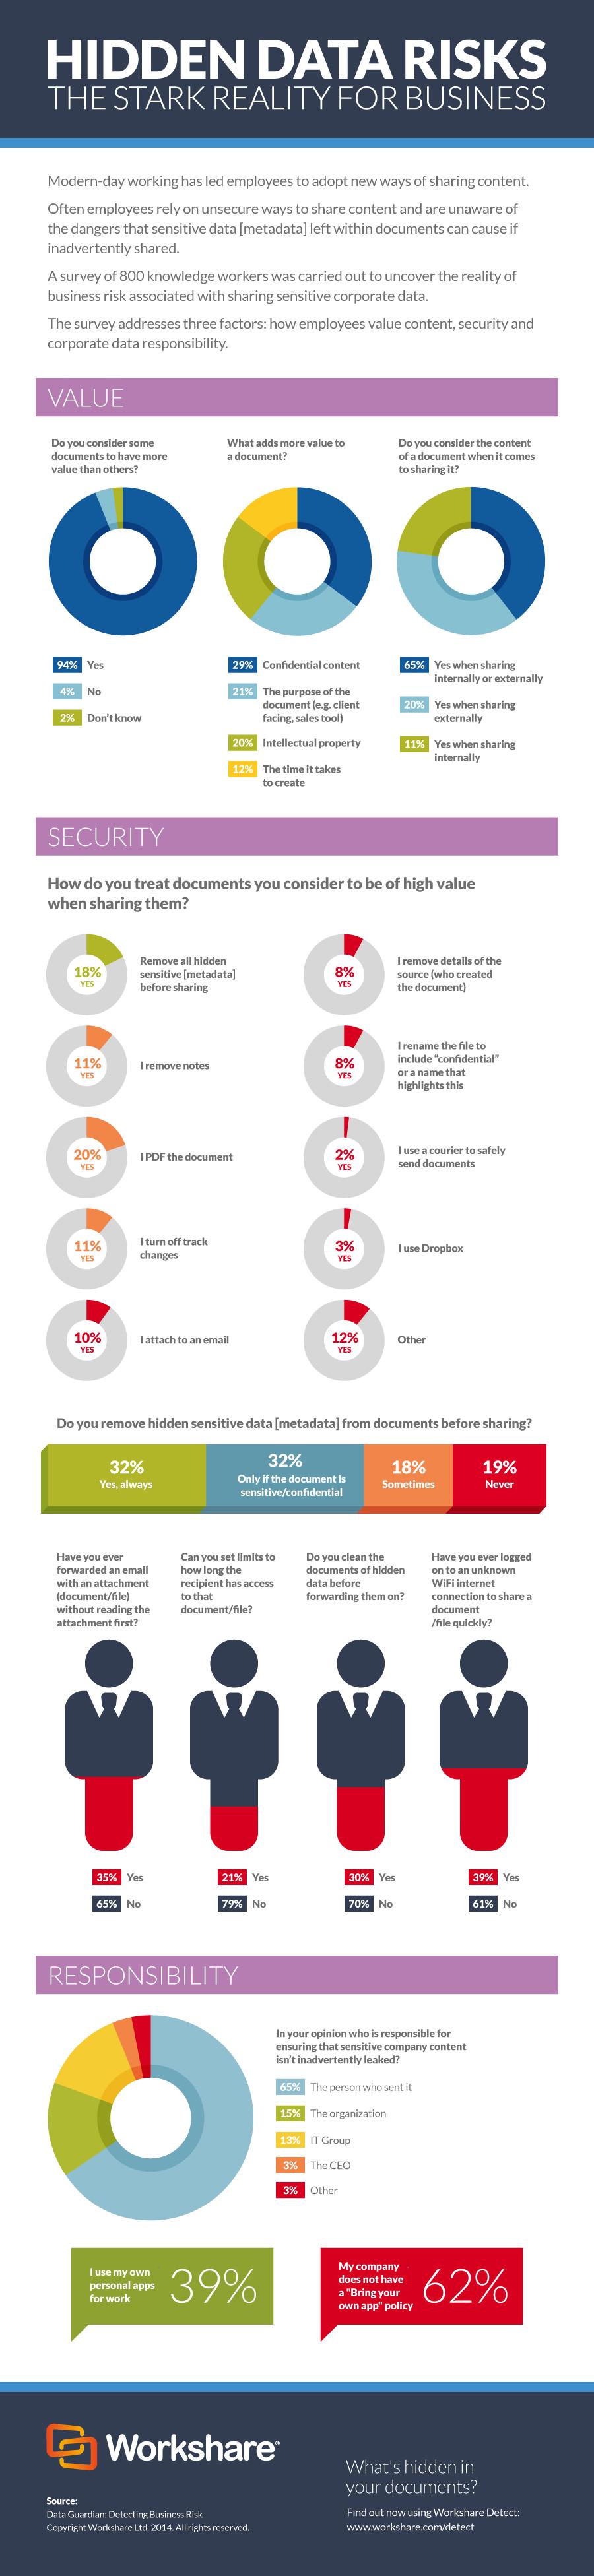 [Infographic] Hidden Data Risks: The Stark Reality for Business